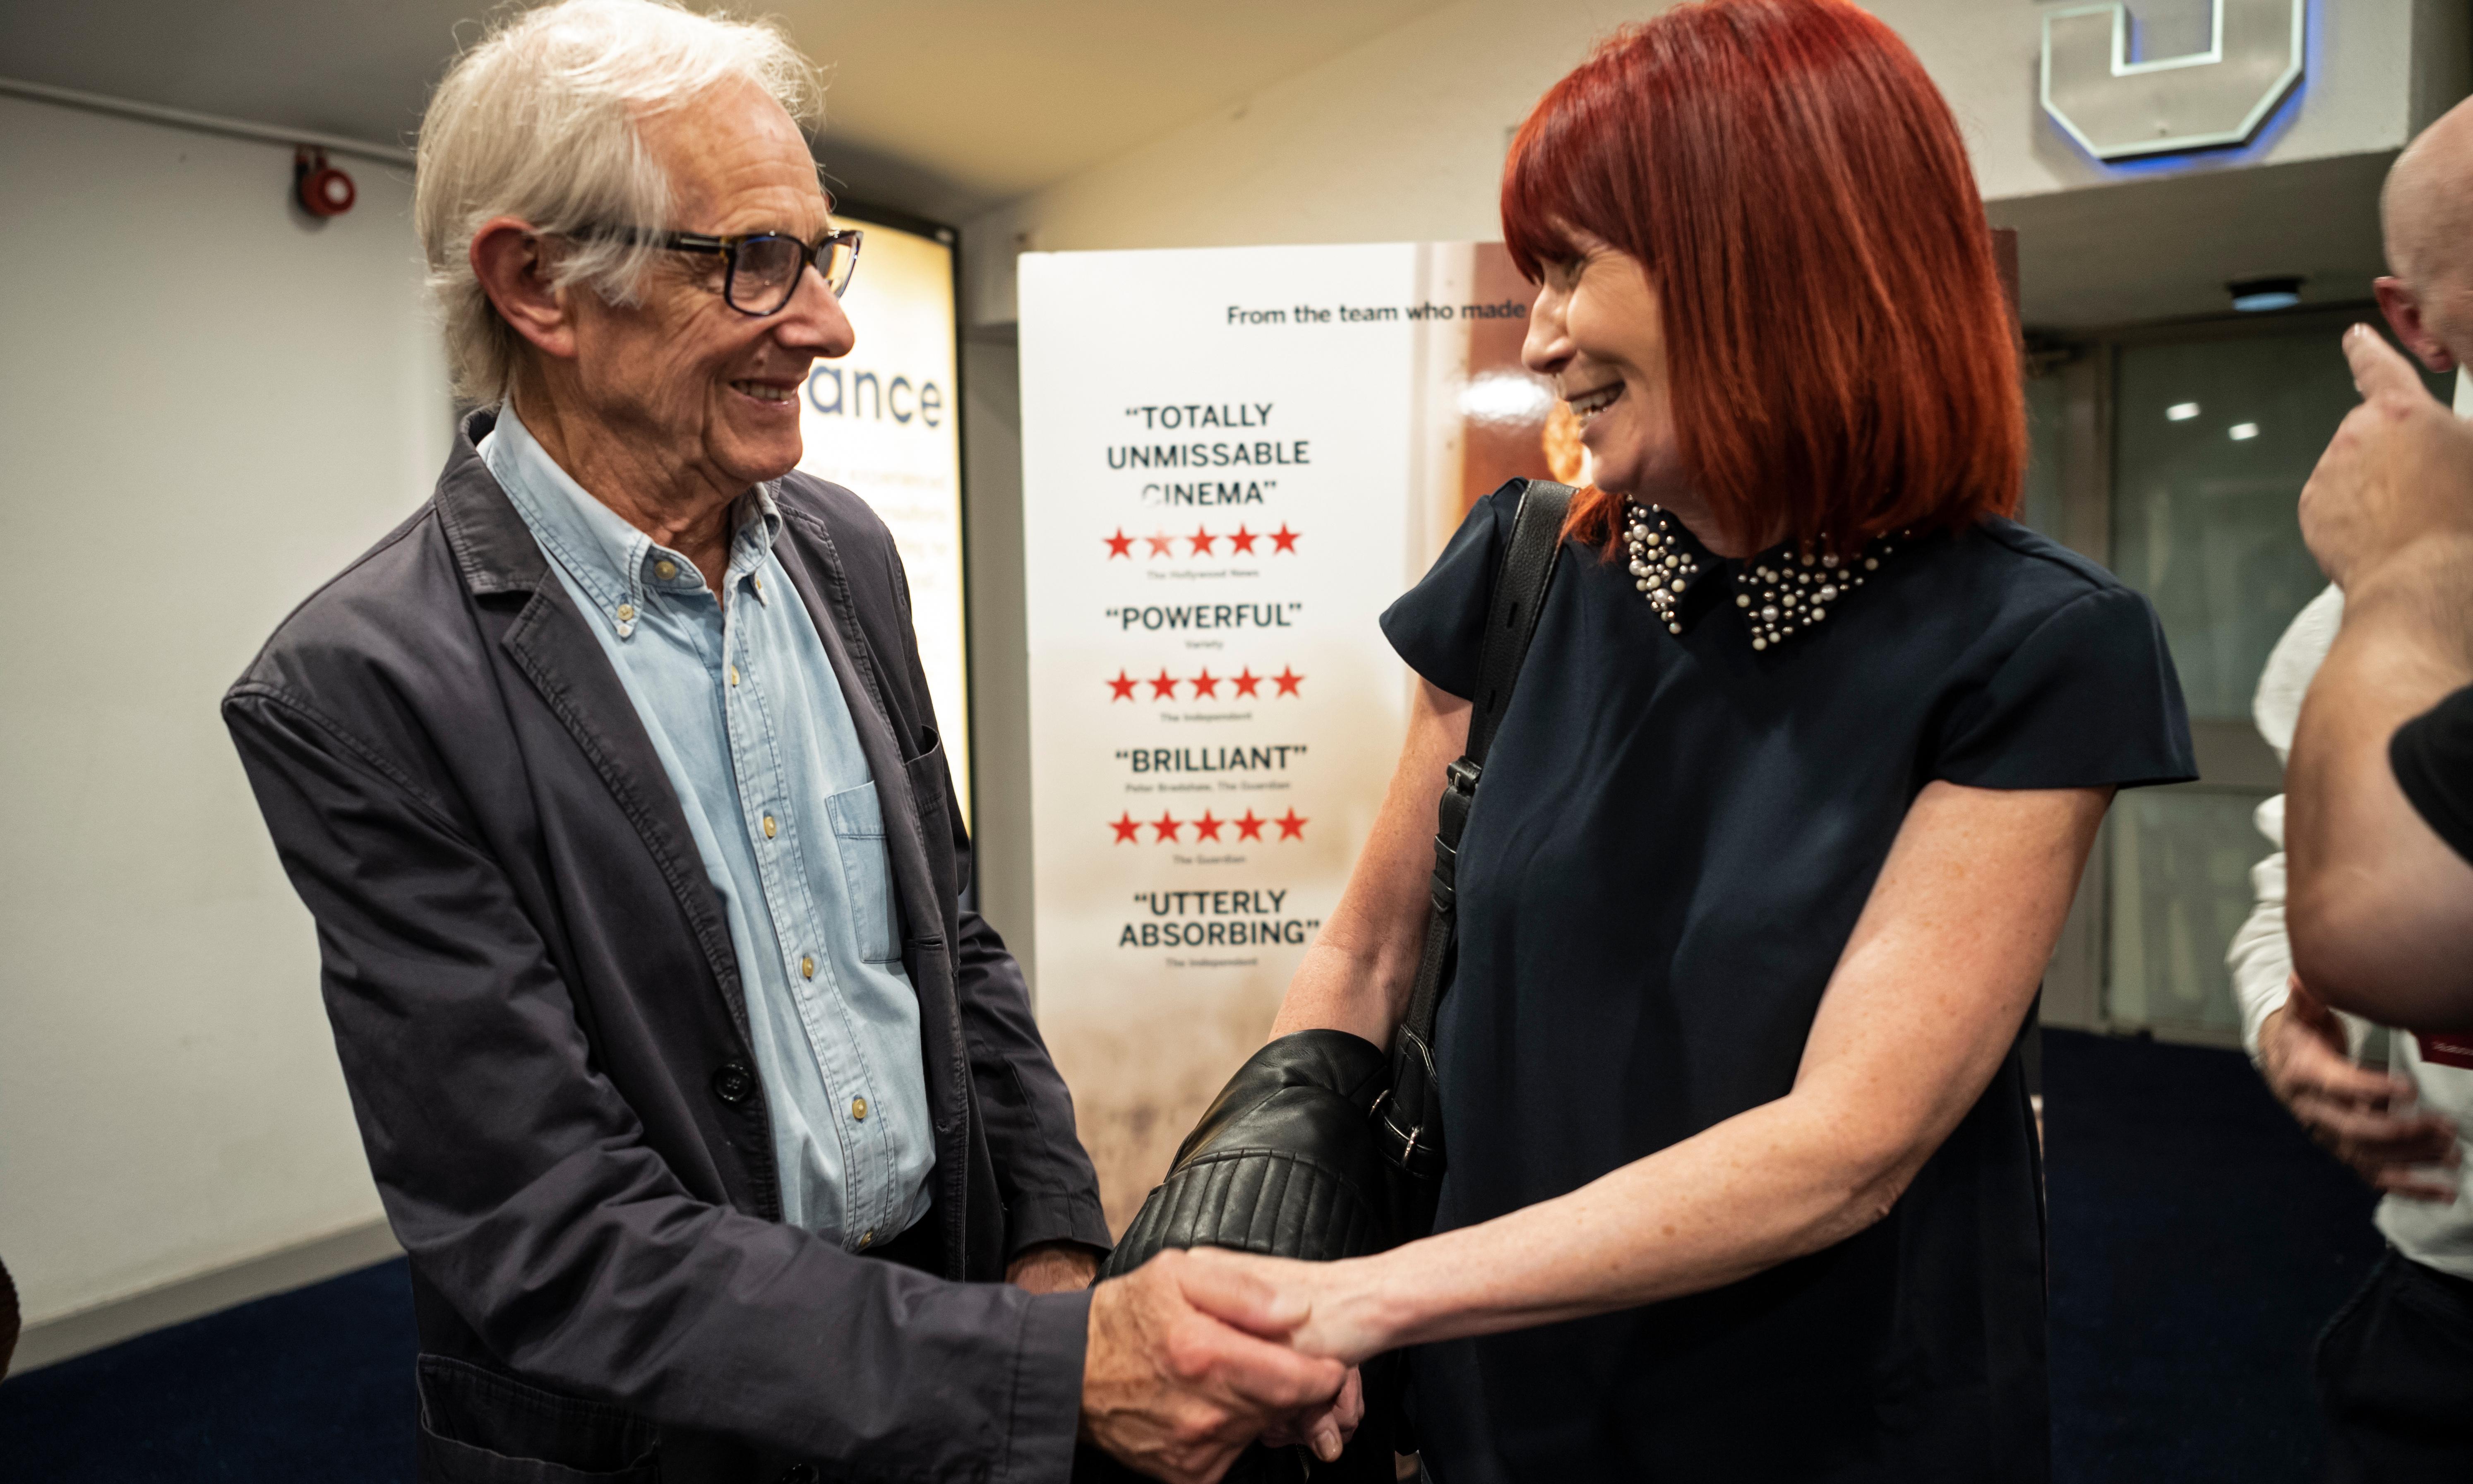 'You give Don a voice': courier's widow praises Ken Loach film